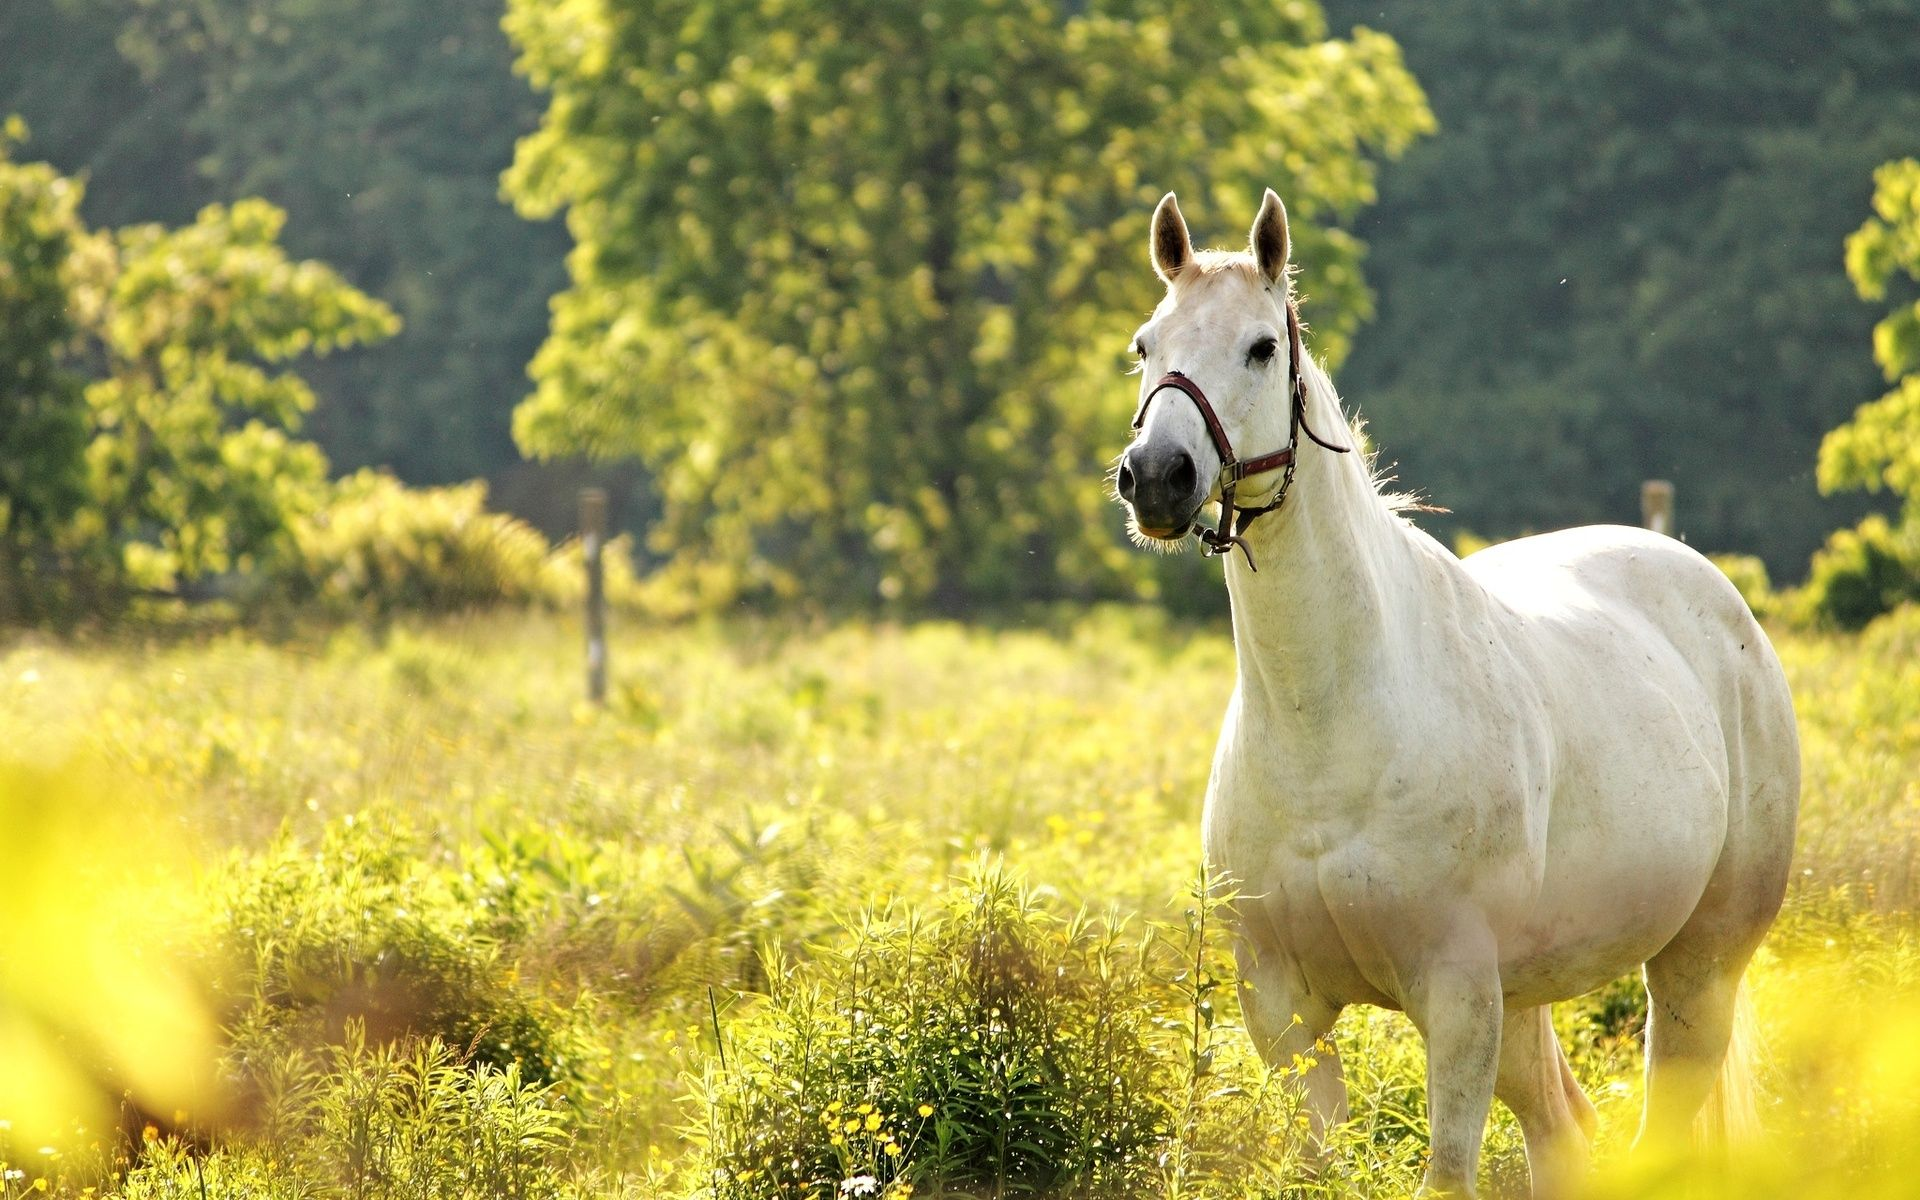 Must see Wallpaper Horse Scenery - 558c15a6cb883284fb5aa213d4b557d1  Photograph_783975.jpg